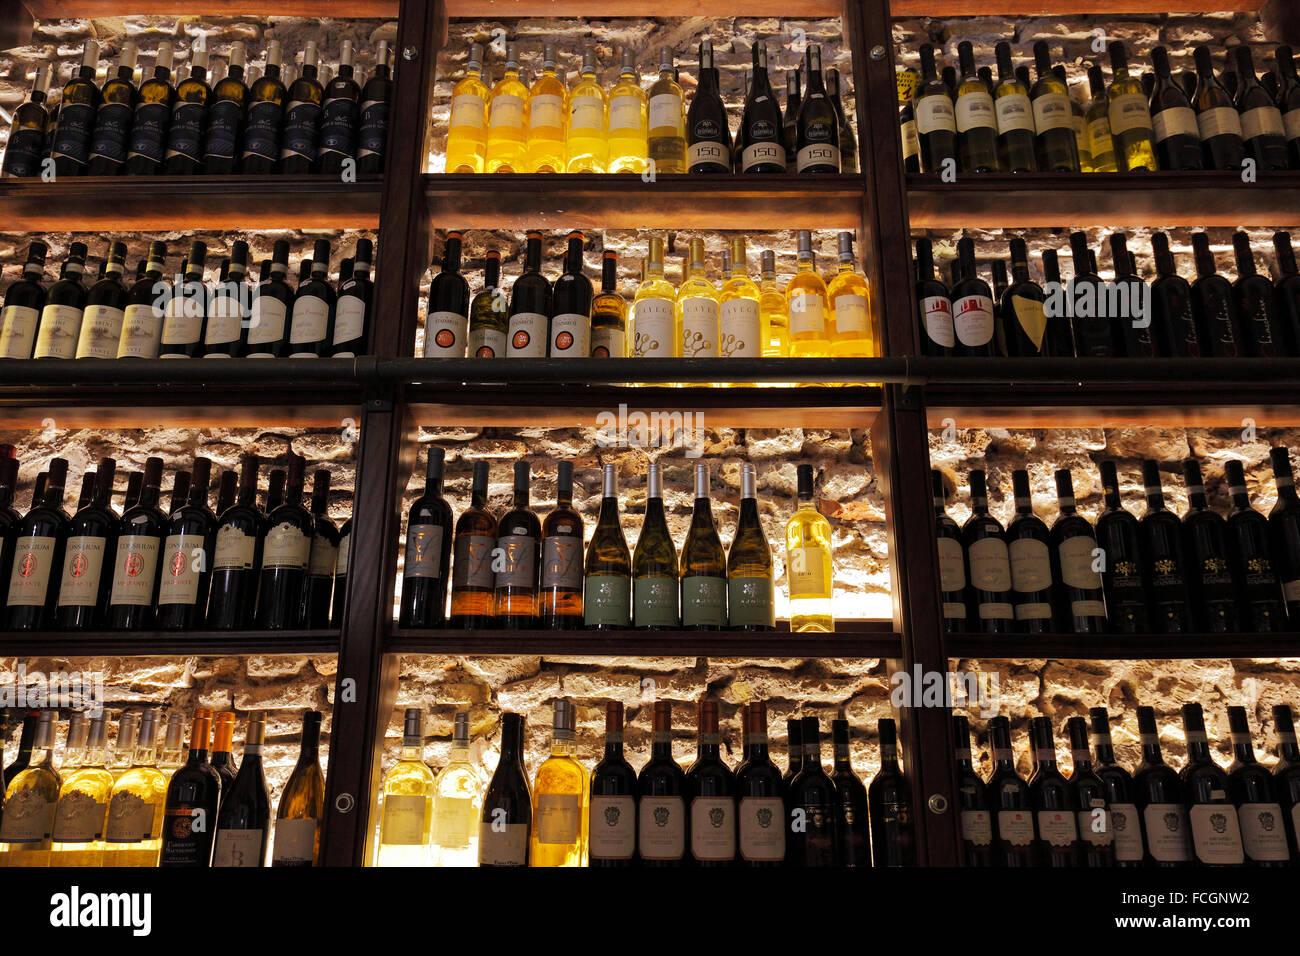 wine shelf in a deli shop in Rome - Stock Image